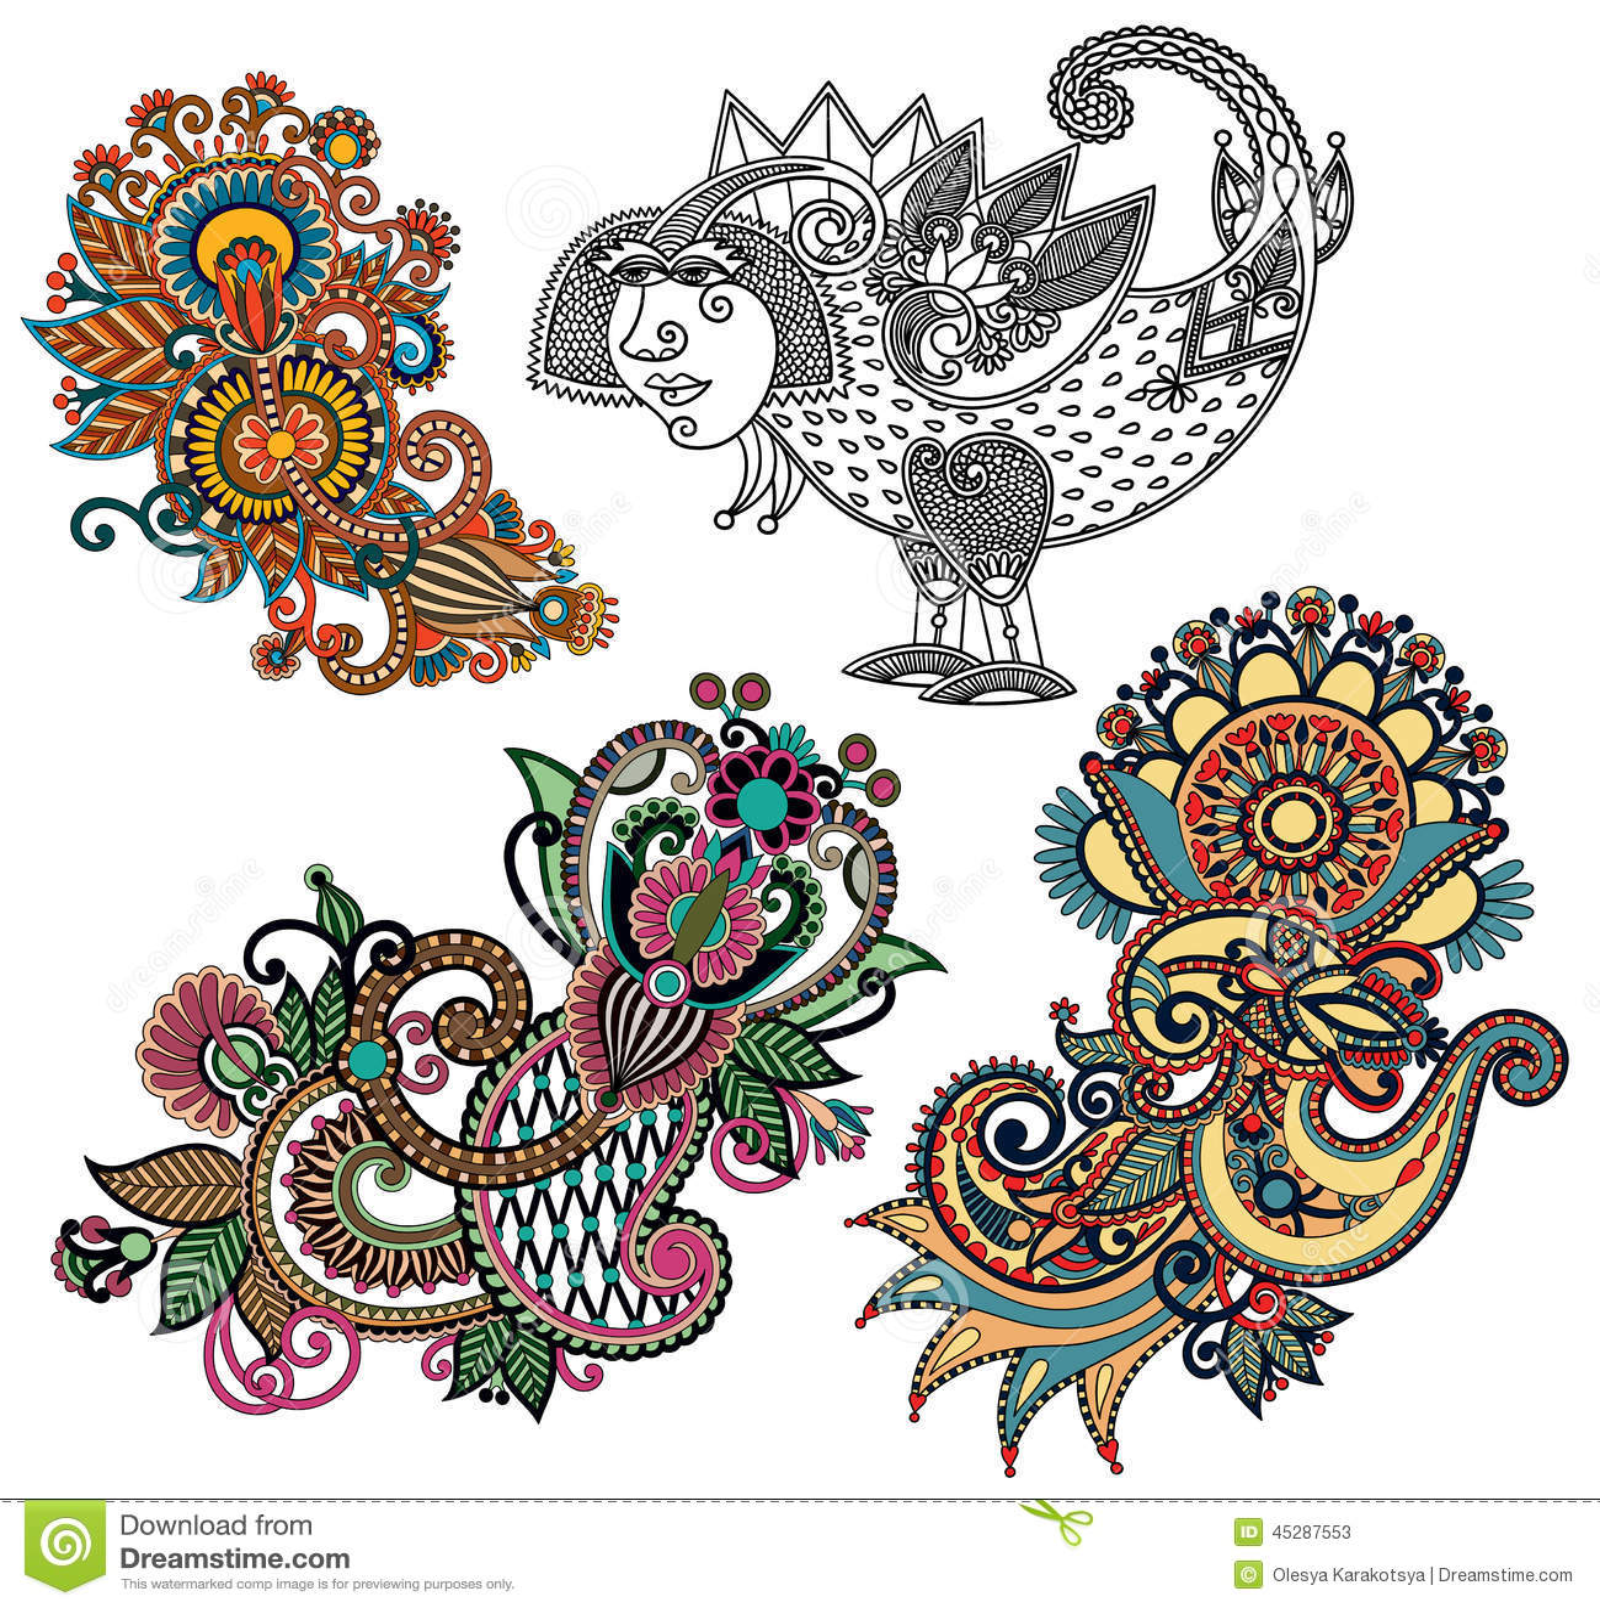 Line And Art Design Srl : Original hand draw line art ornate flower design stock